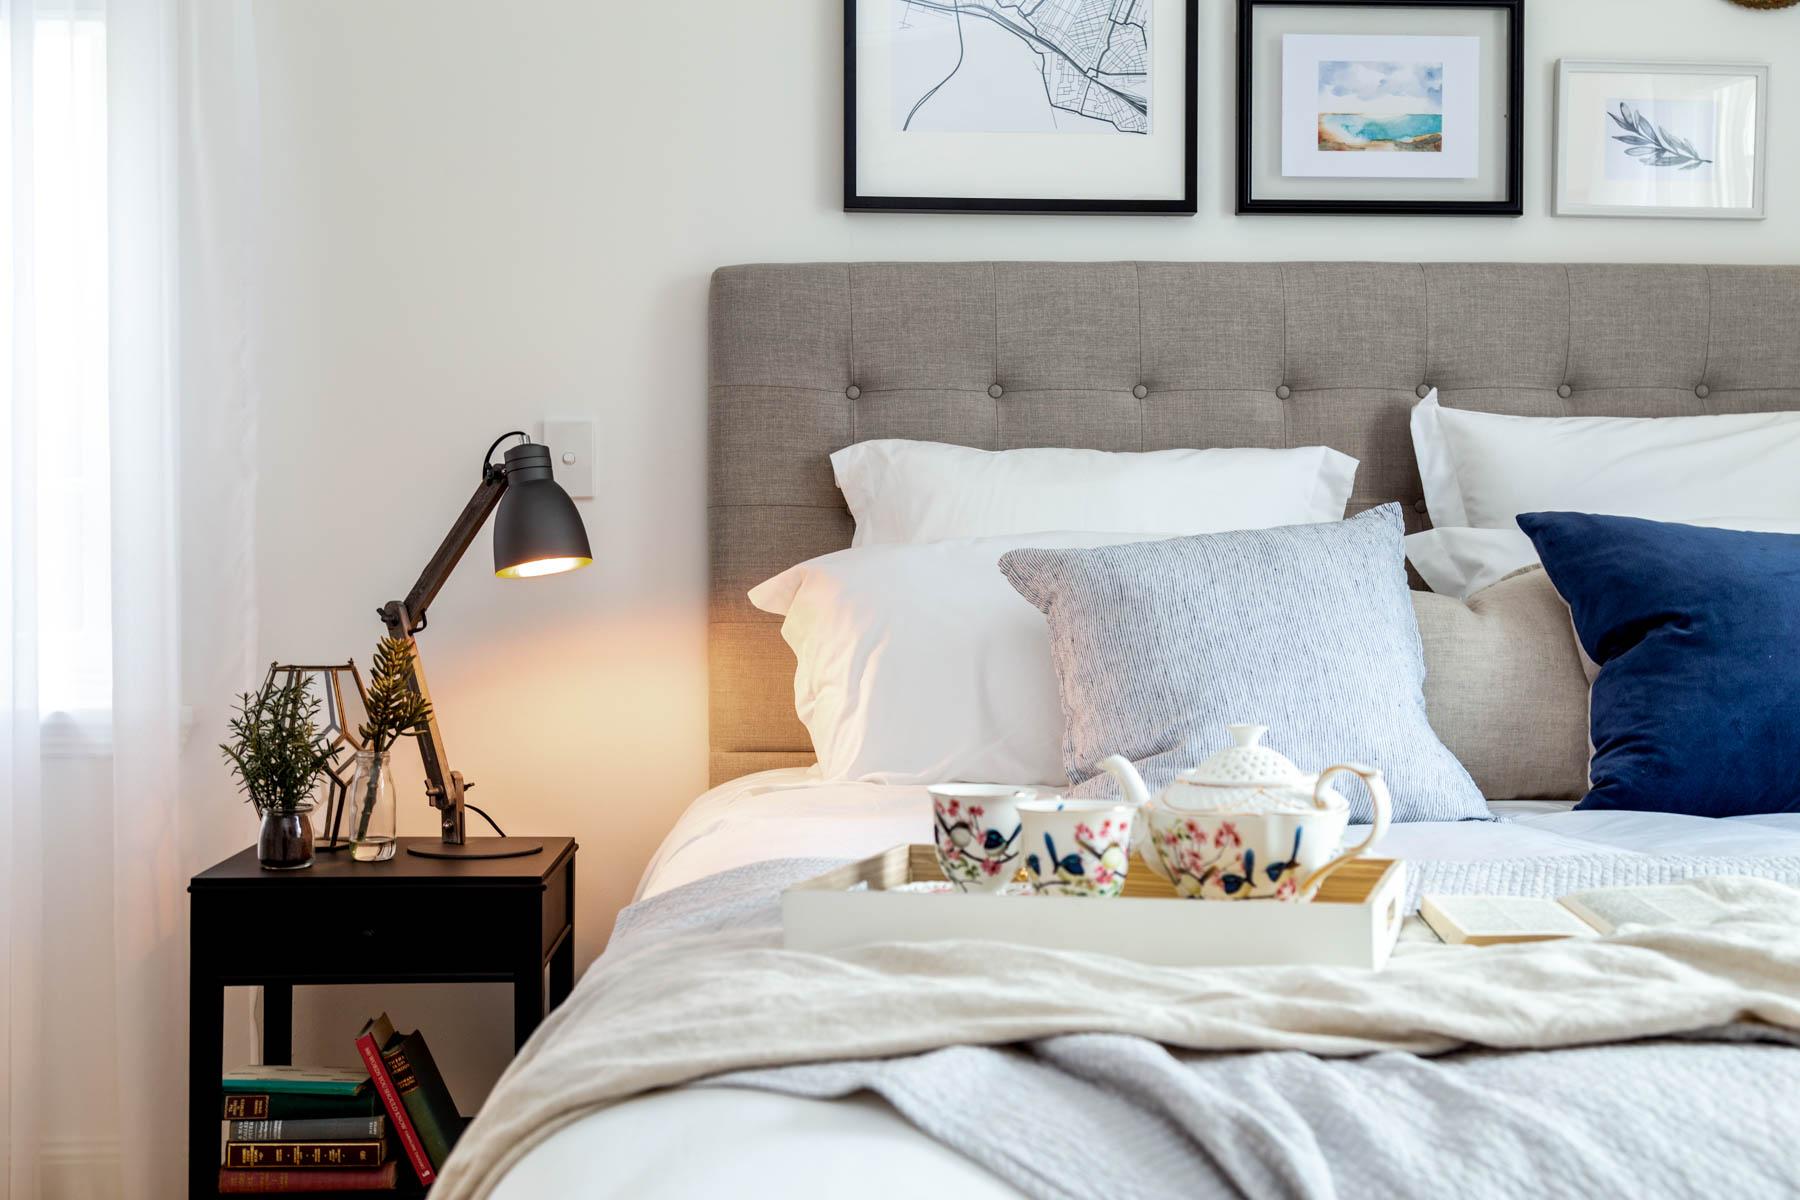 Renovation, Restoration, Extensions, Design, Builders, Goolwa, Fleurieu, Cottage, Luxury Bedroom